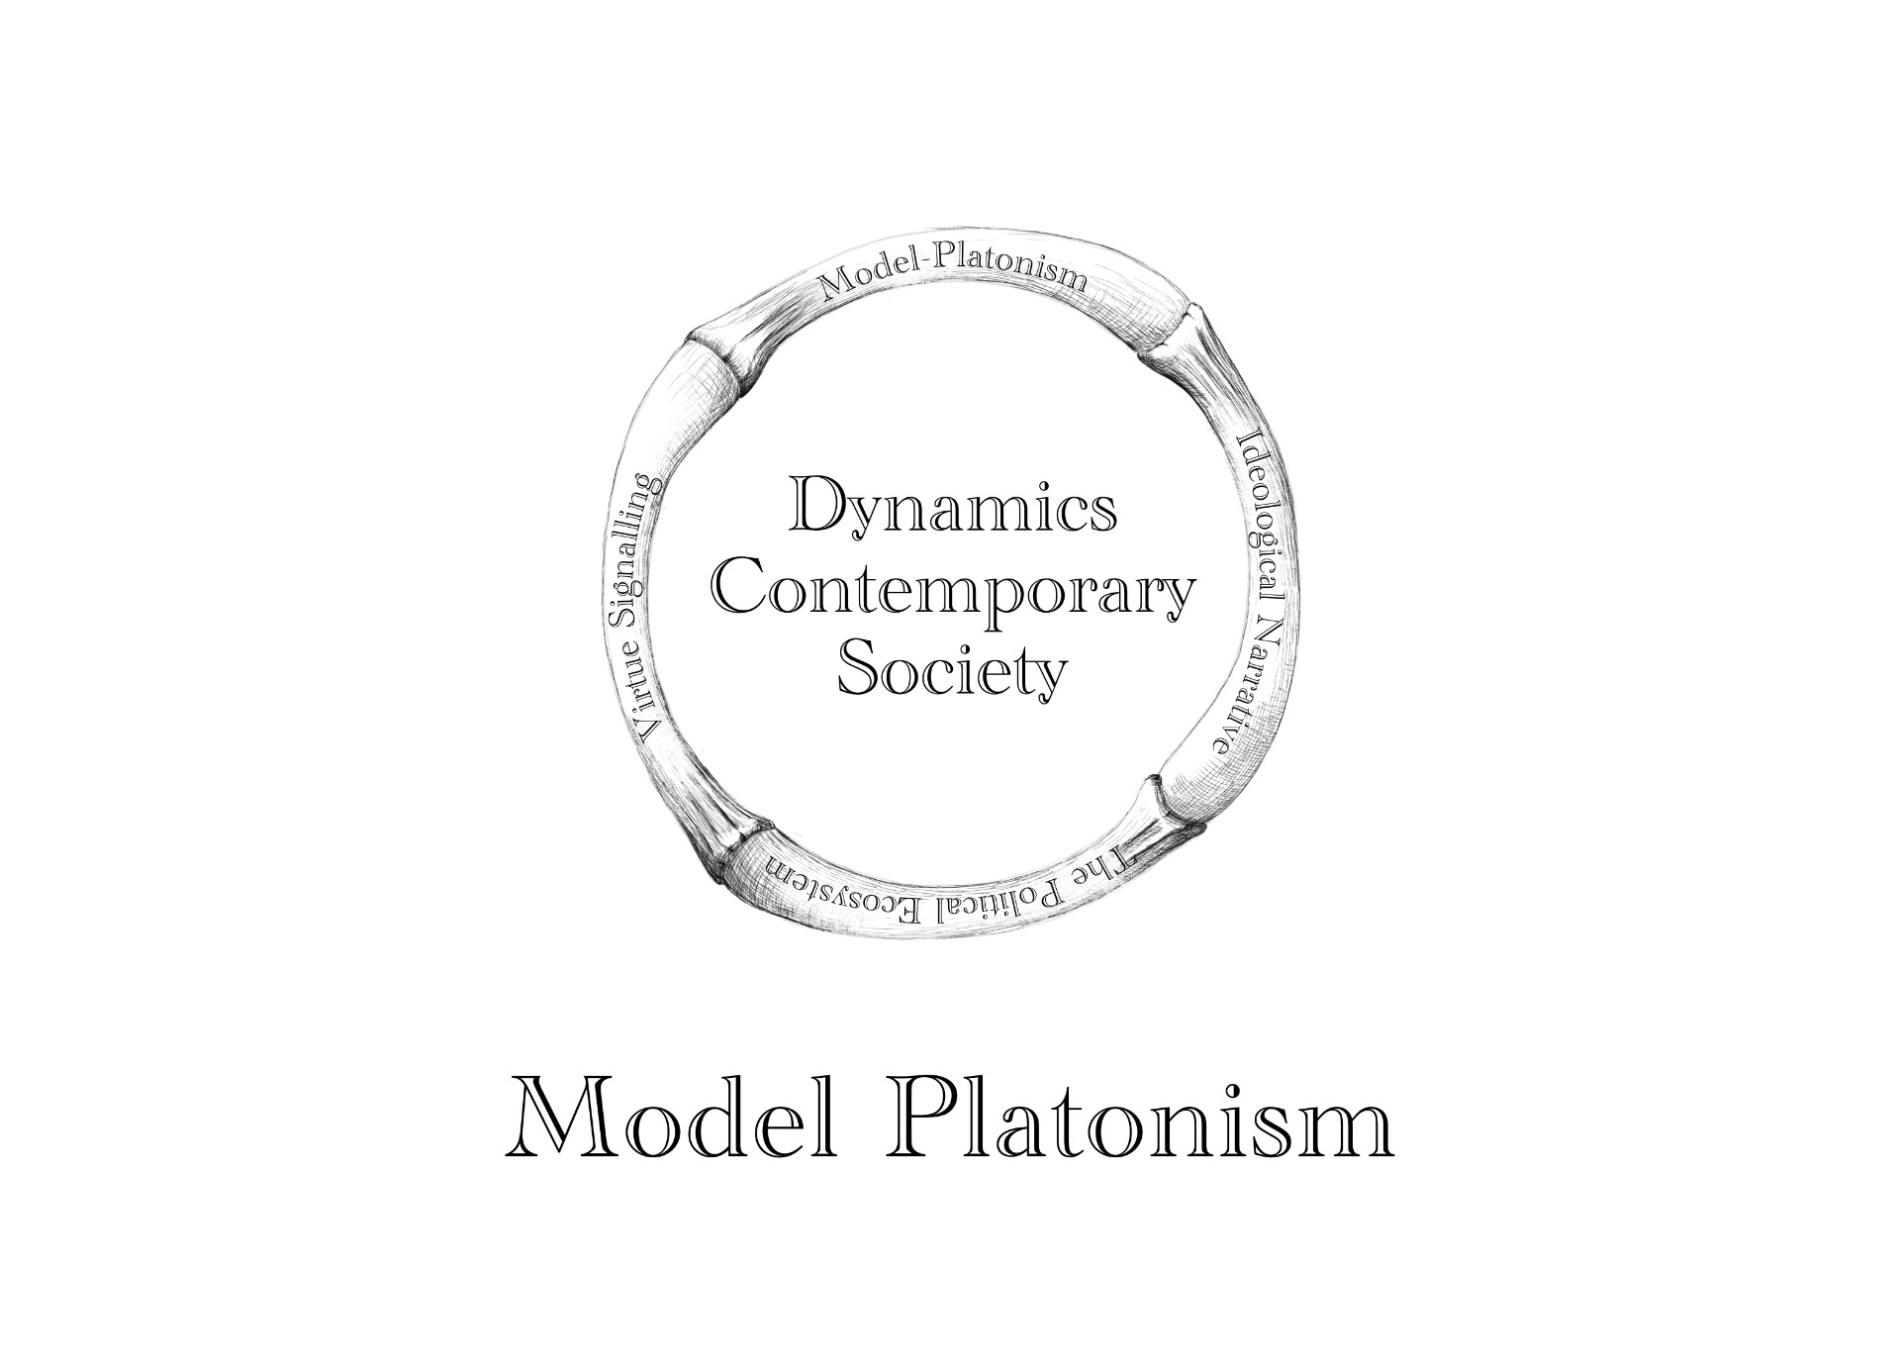 Model Platonism p p p